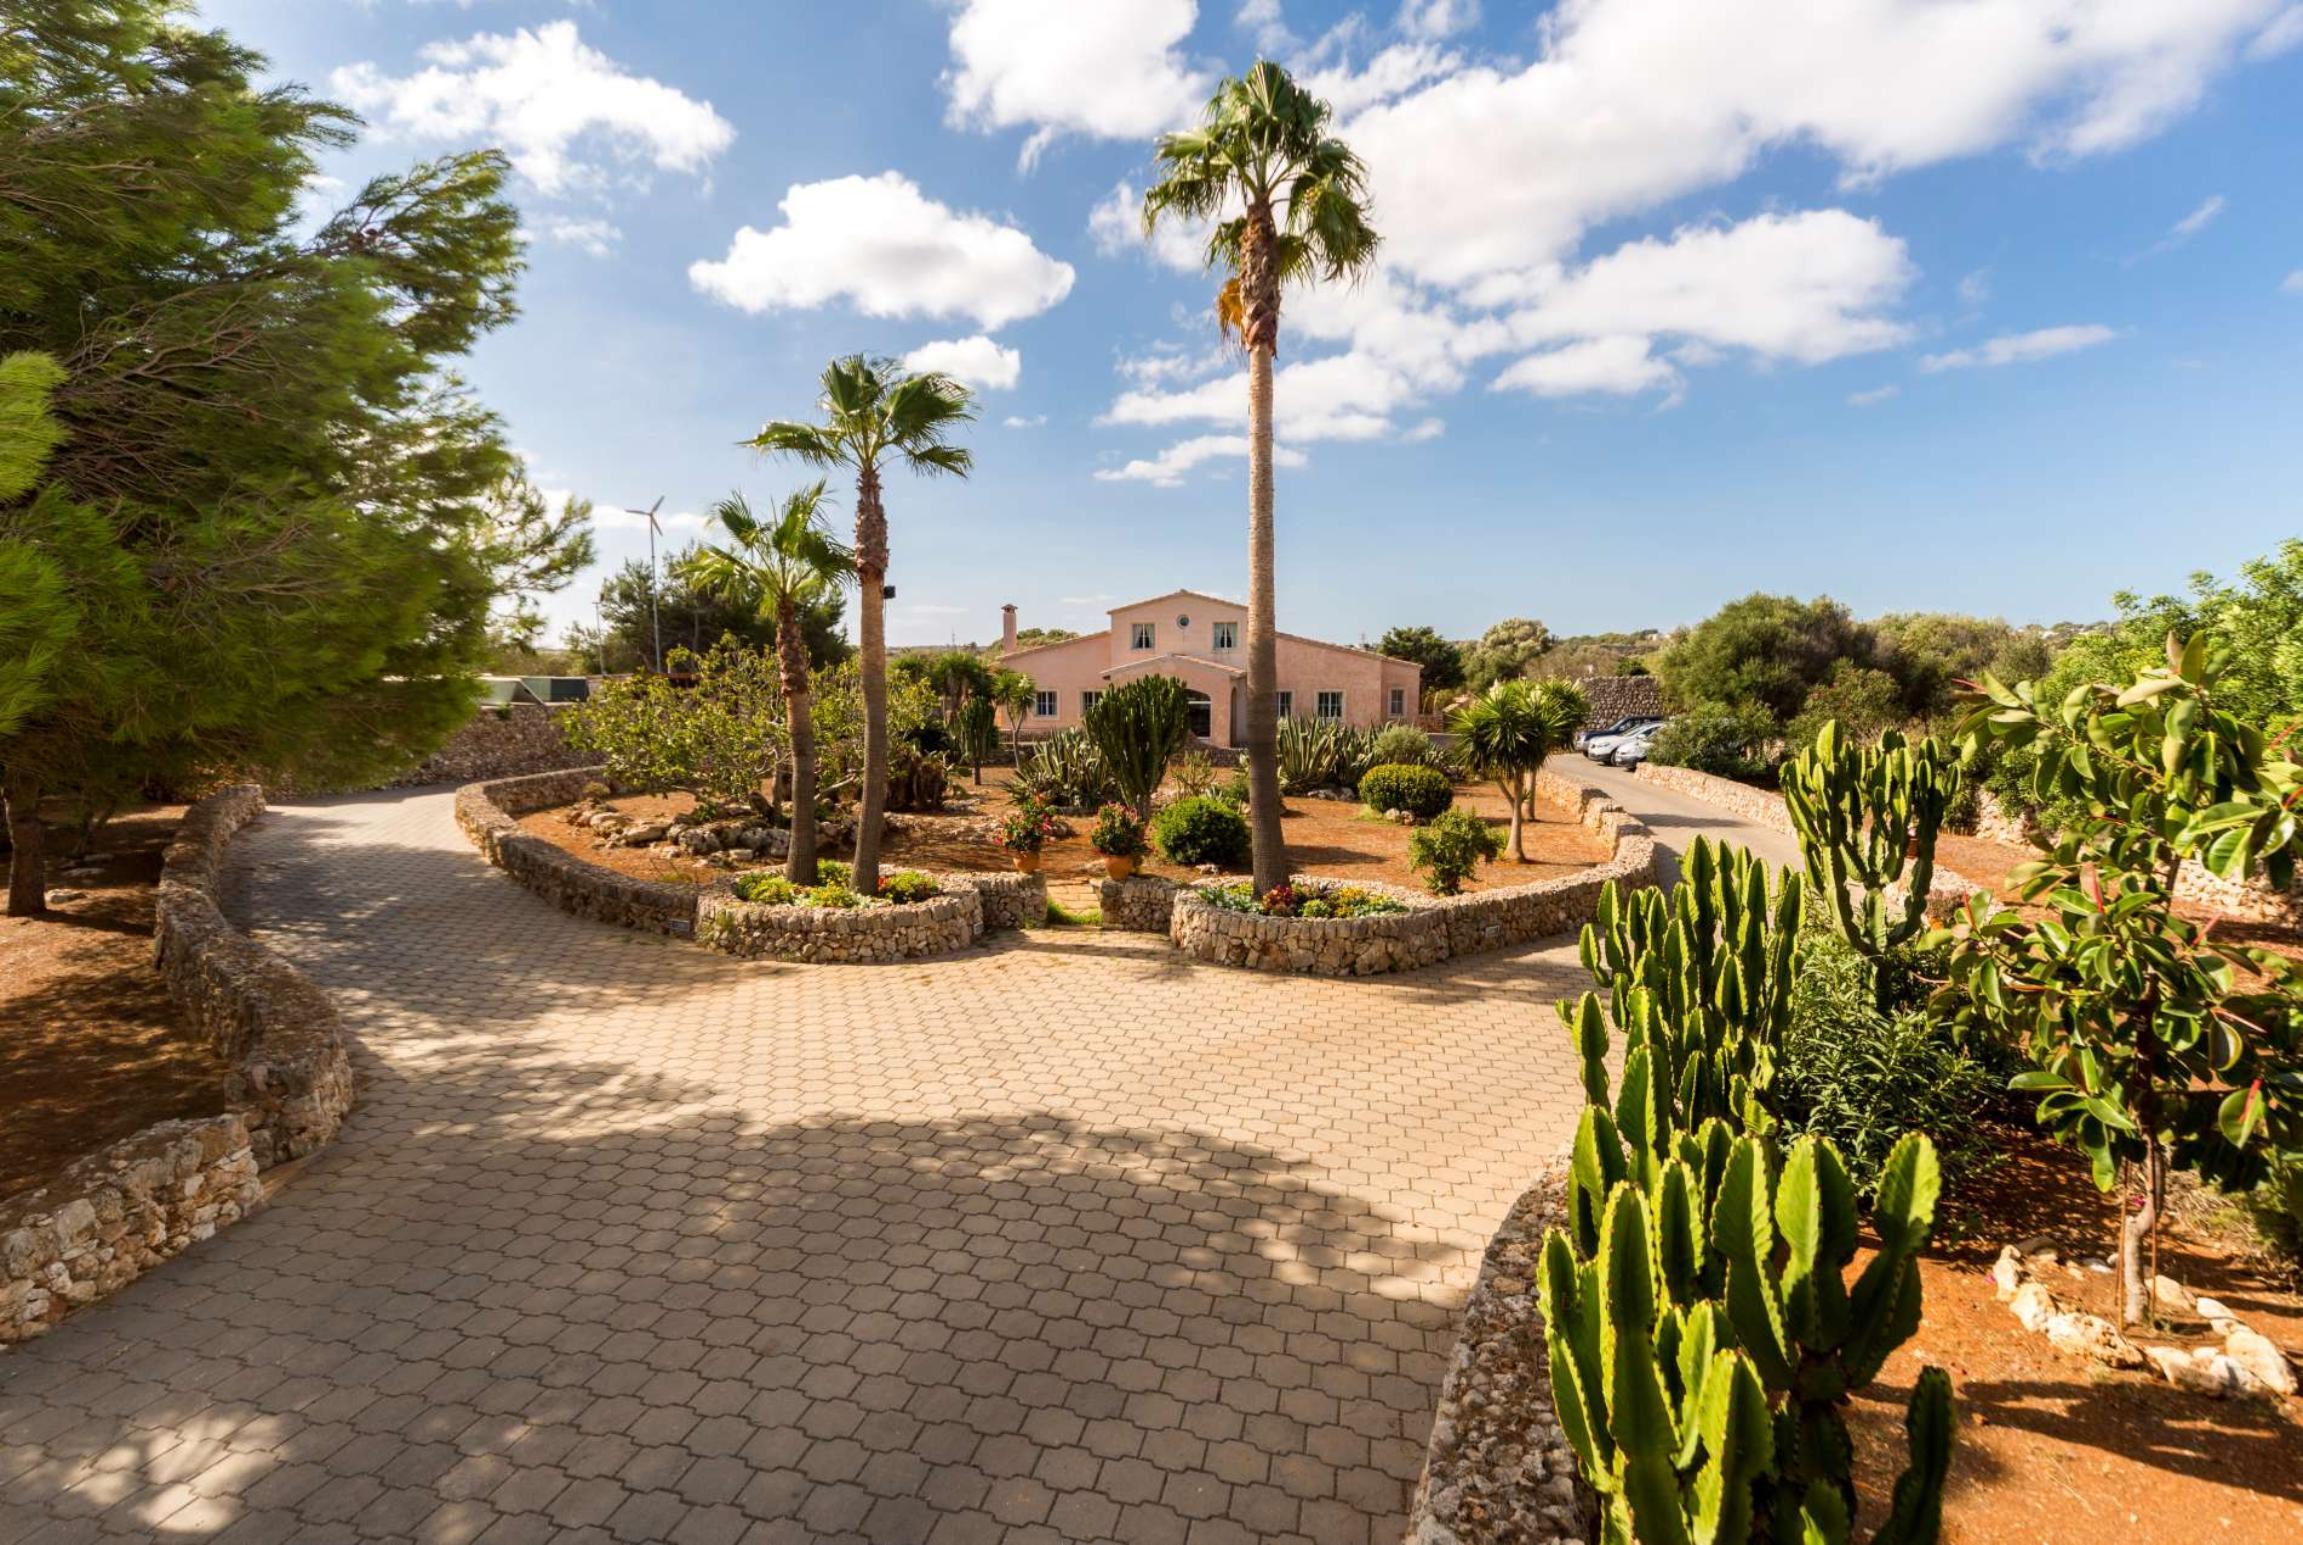 Ferienhaus Villa Estrellita (2649653), Punta Prima, Menorca, Balearische Inseln, Spanien, Bild 22